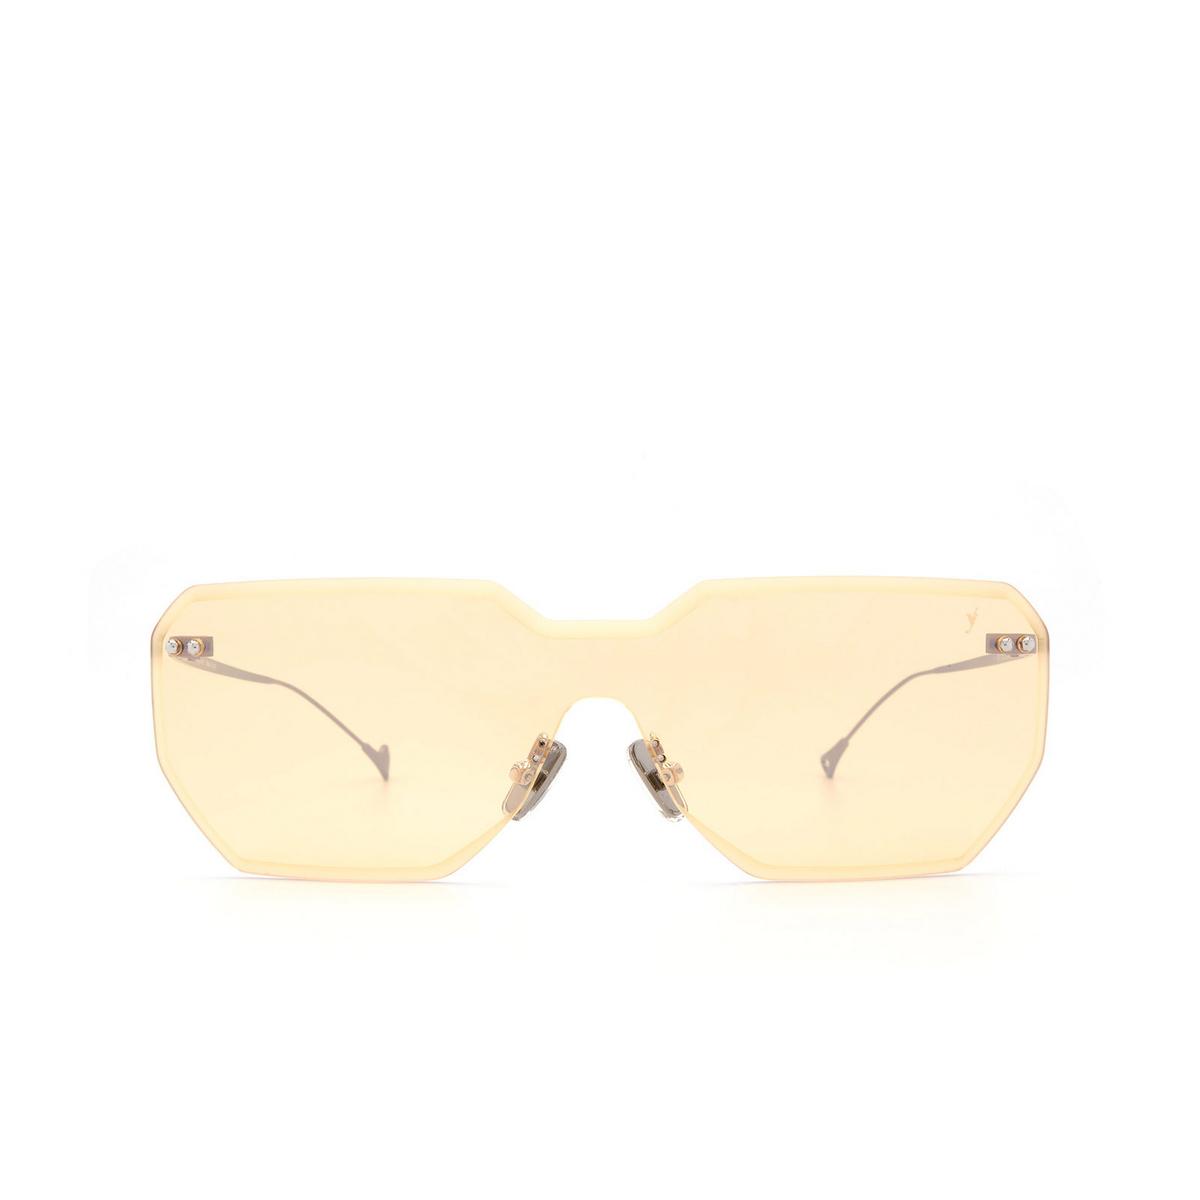 Eyepetizer® Mask Sunglasses: Brickel color Gunmetal C.3-24F - front view.